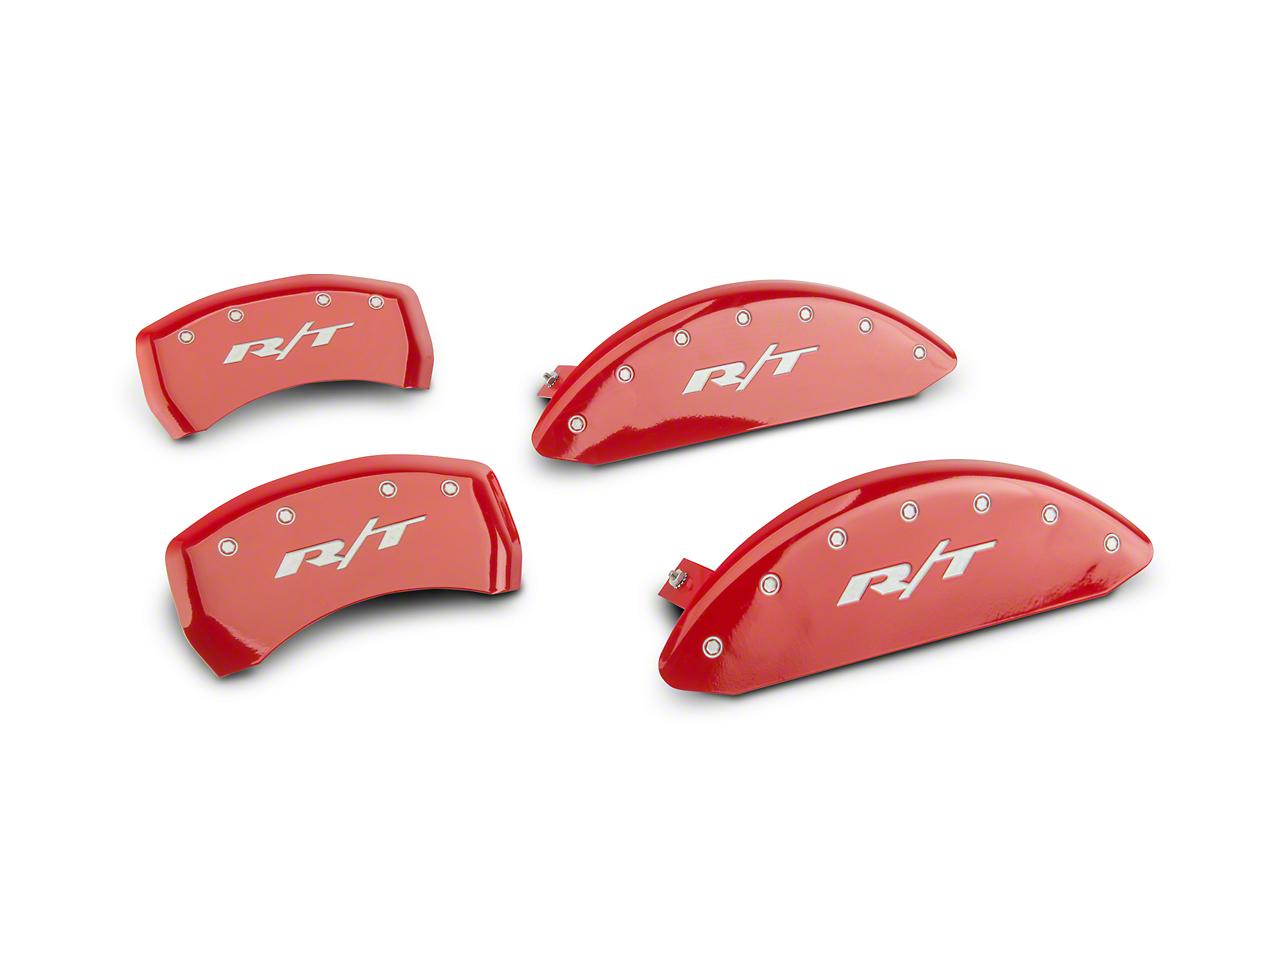 MGP Red Caliper Covers w/ R/T Logo - Front & Rear (11-19 R/T; 2014 Rallye Redline; 17-19 GT, T/A; 12-19 SXT w/ Dual Piston Front Caliper)